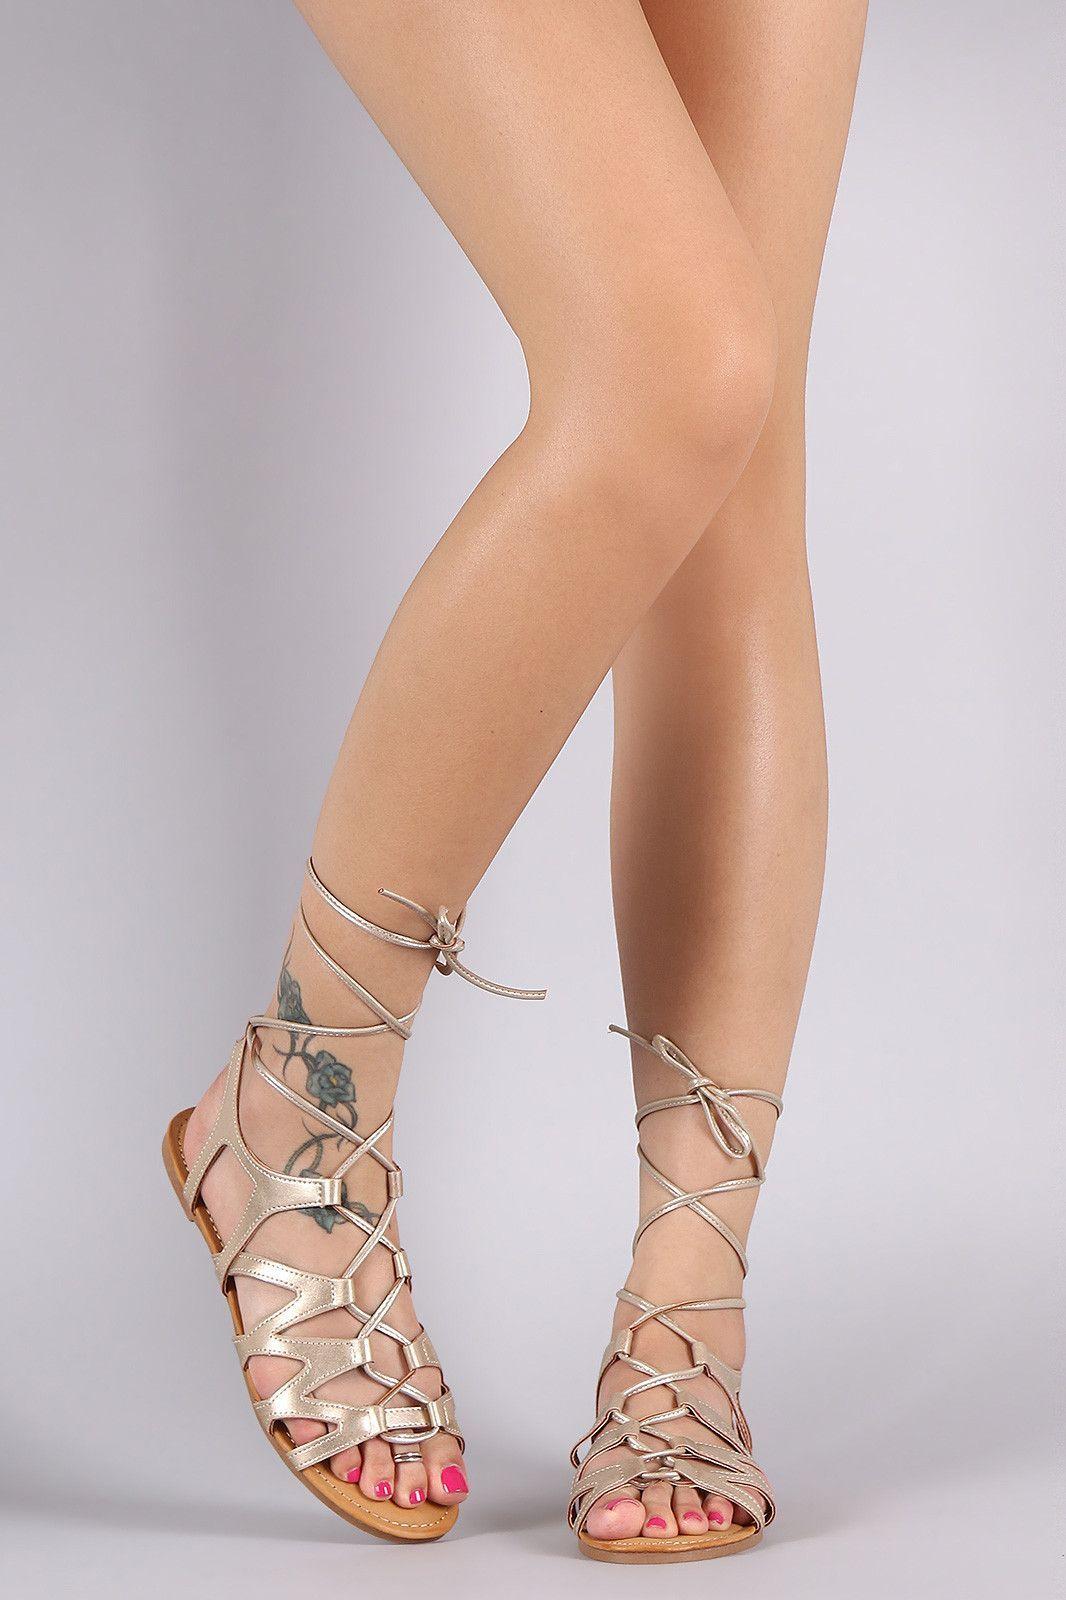 6f99d27c339 Bamboo Leg Wrap Lace Up Gladiator Sandal